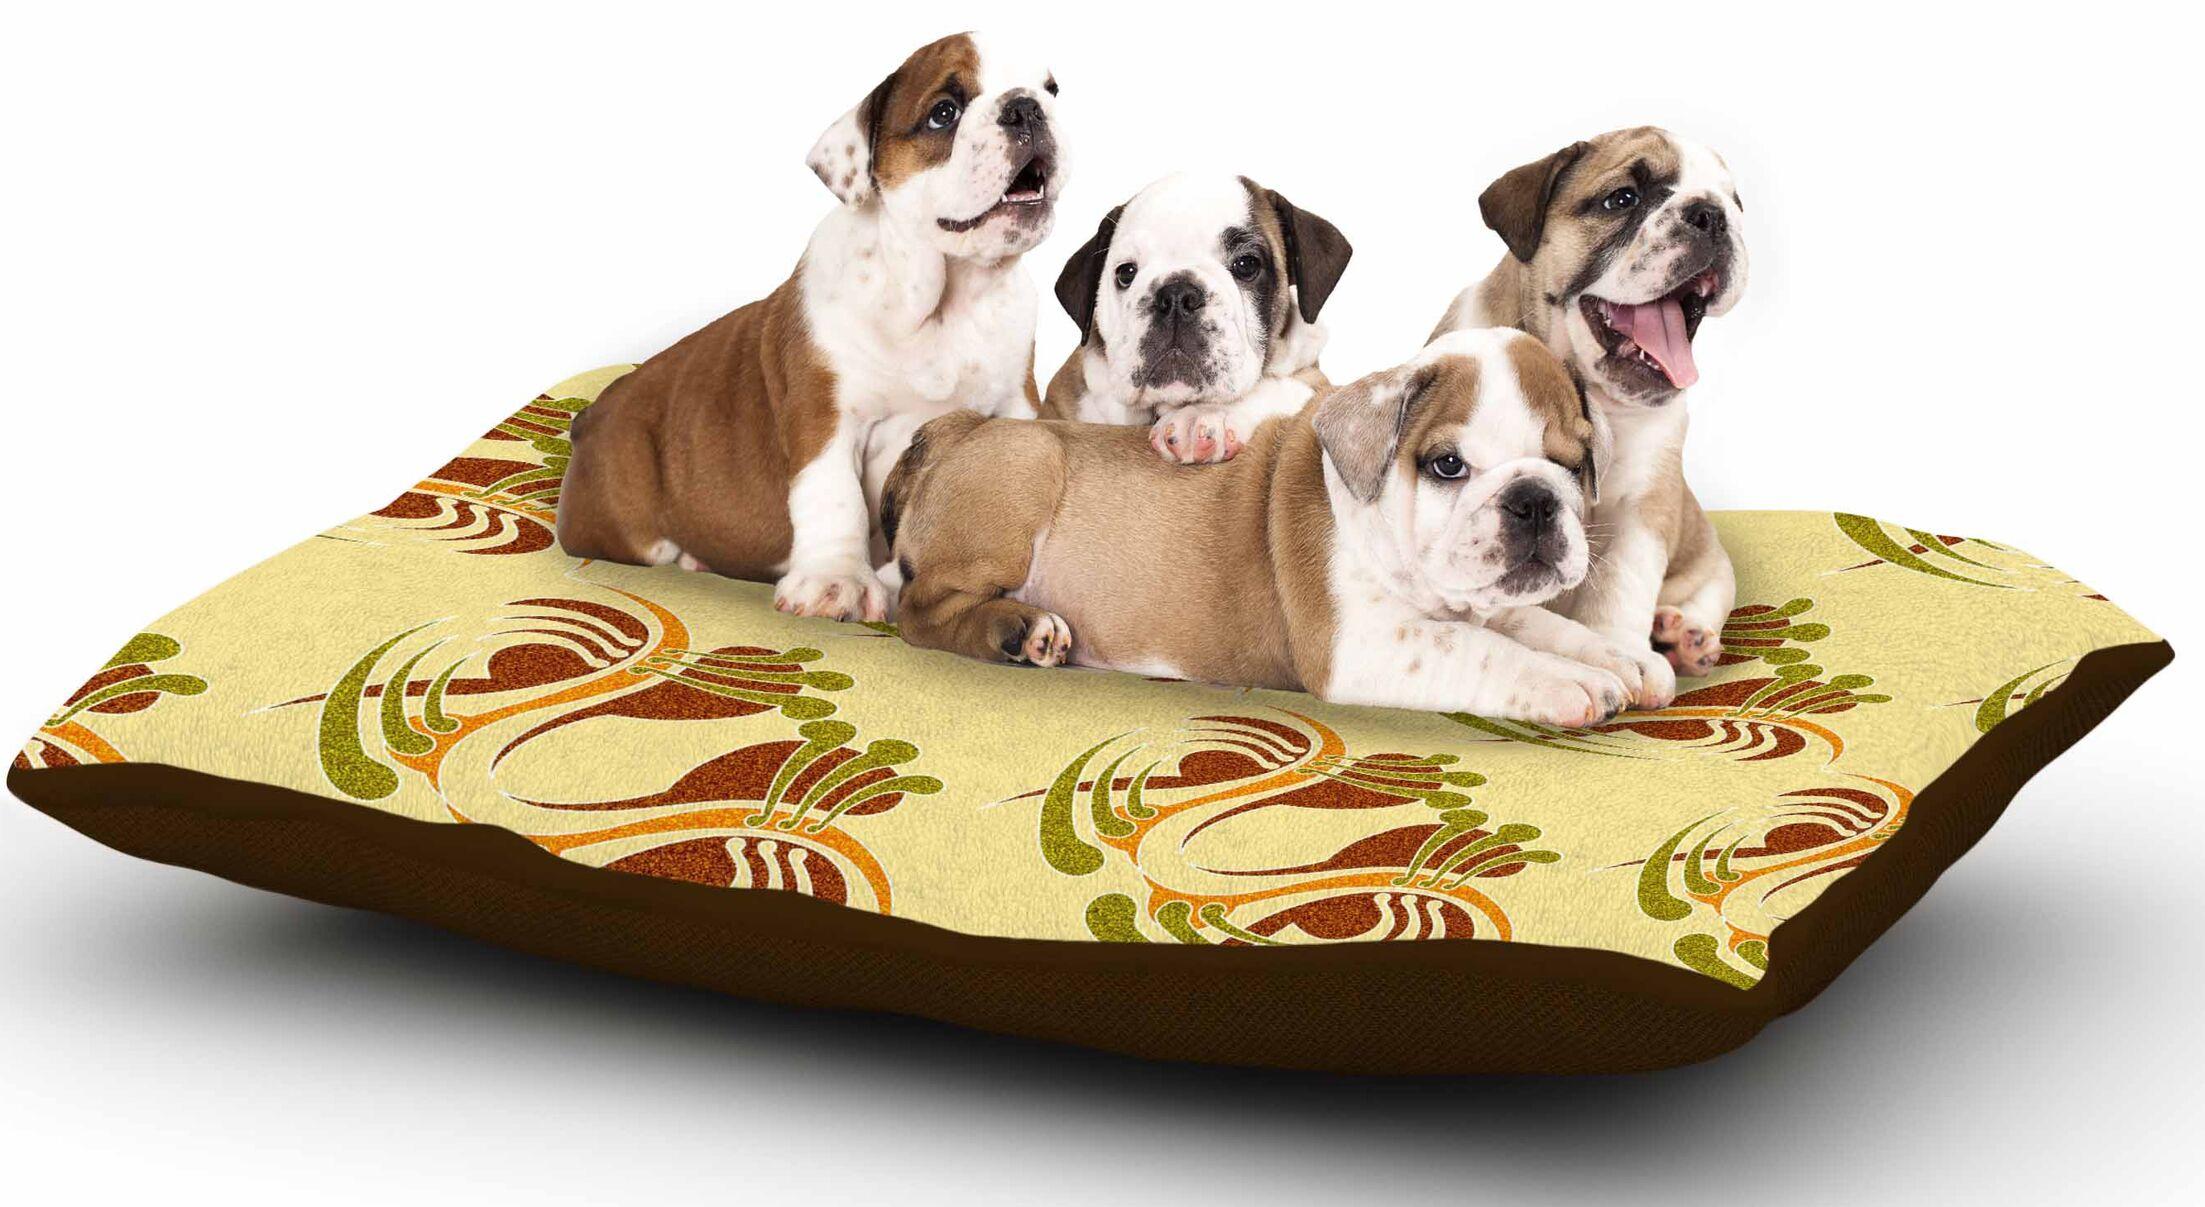 Dan Sekanwagi 'Curvaceous' Dog Pillow with Fleece Cozy Top